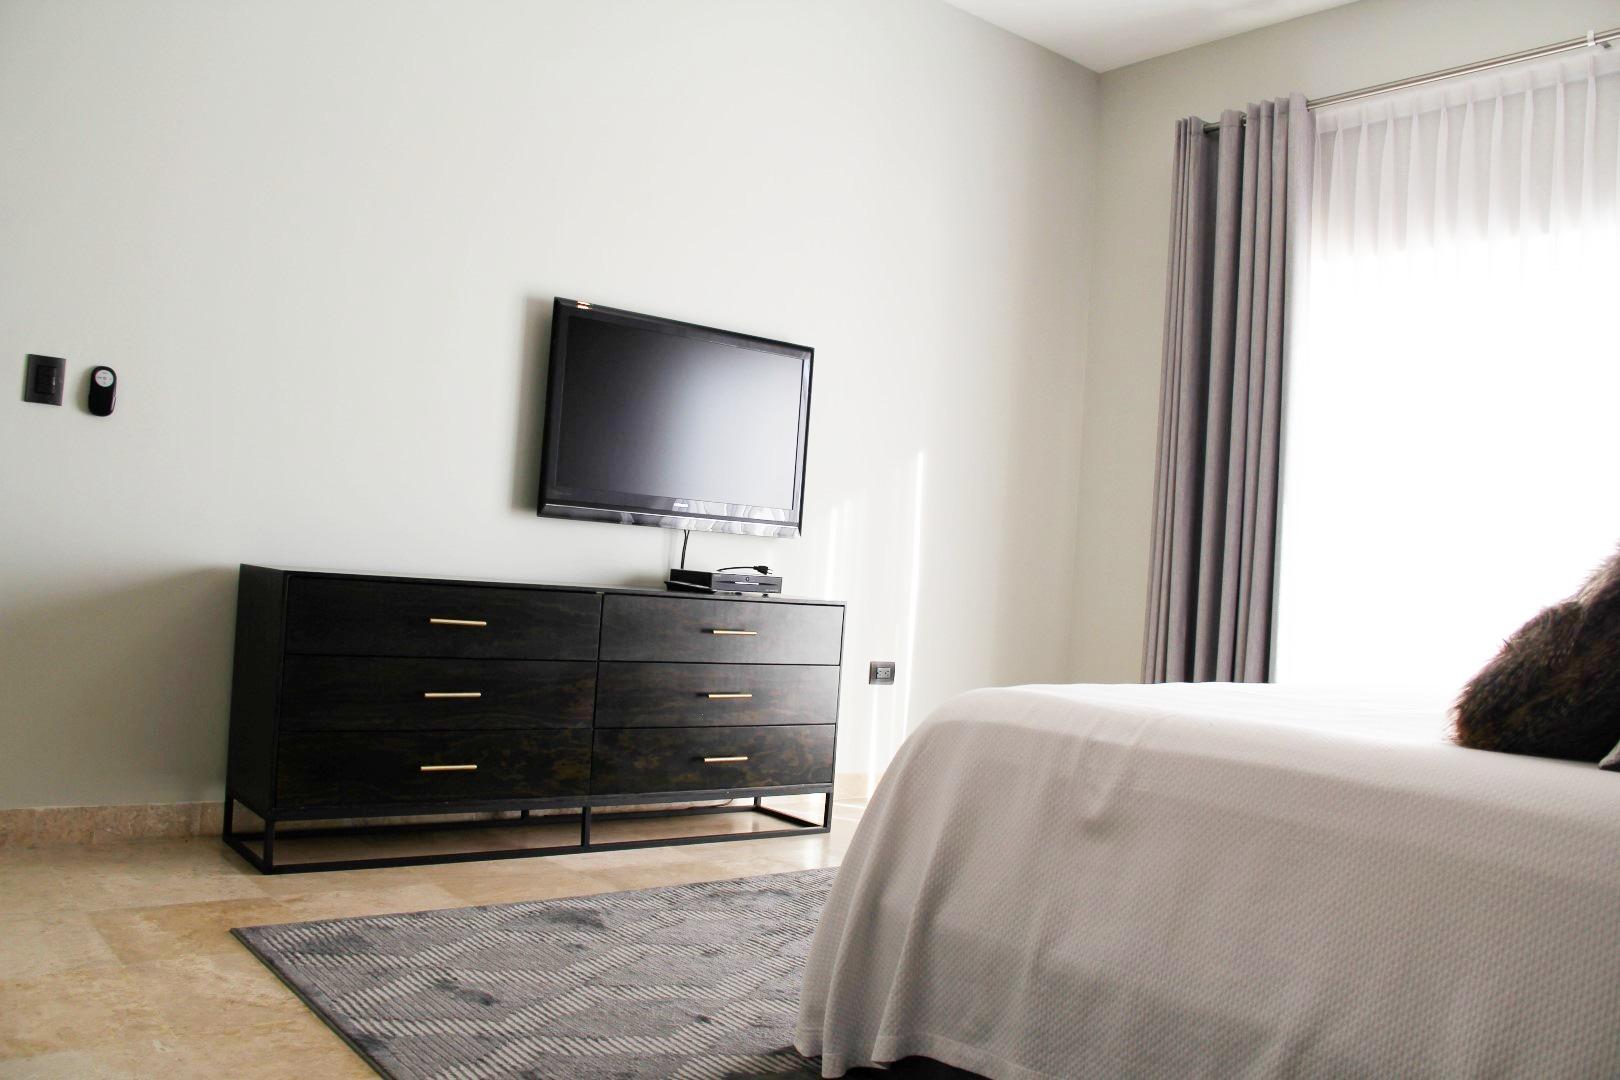 TV in master bedroom.